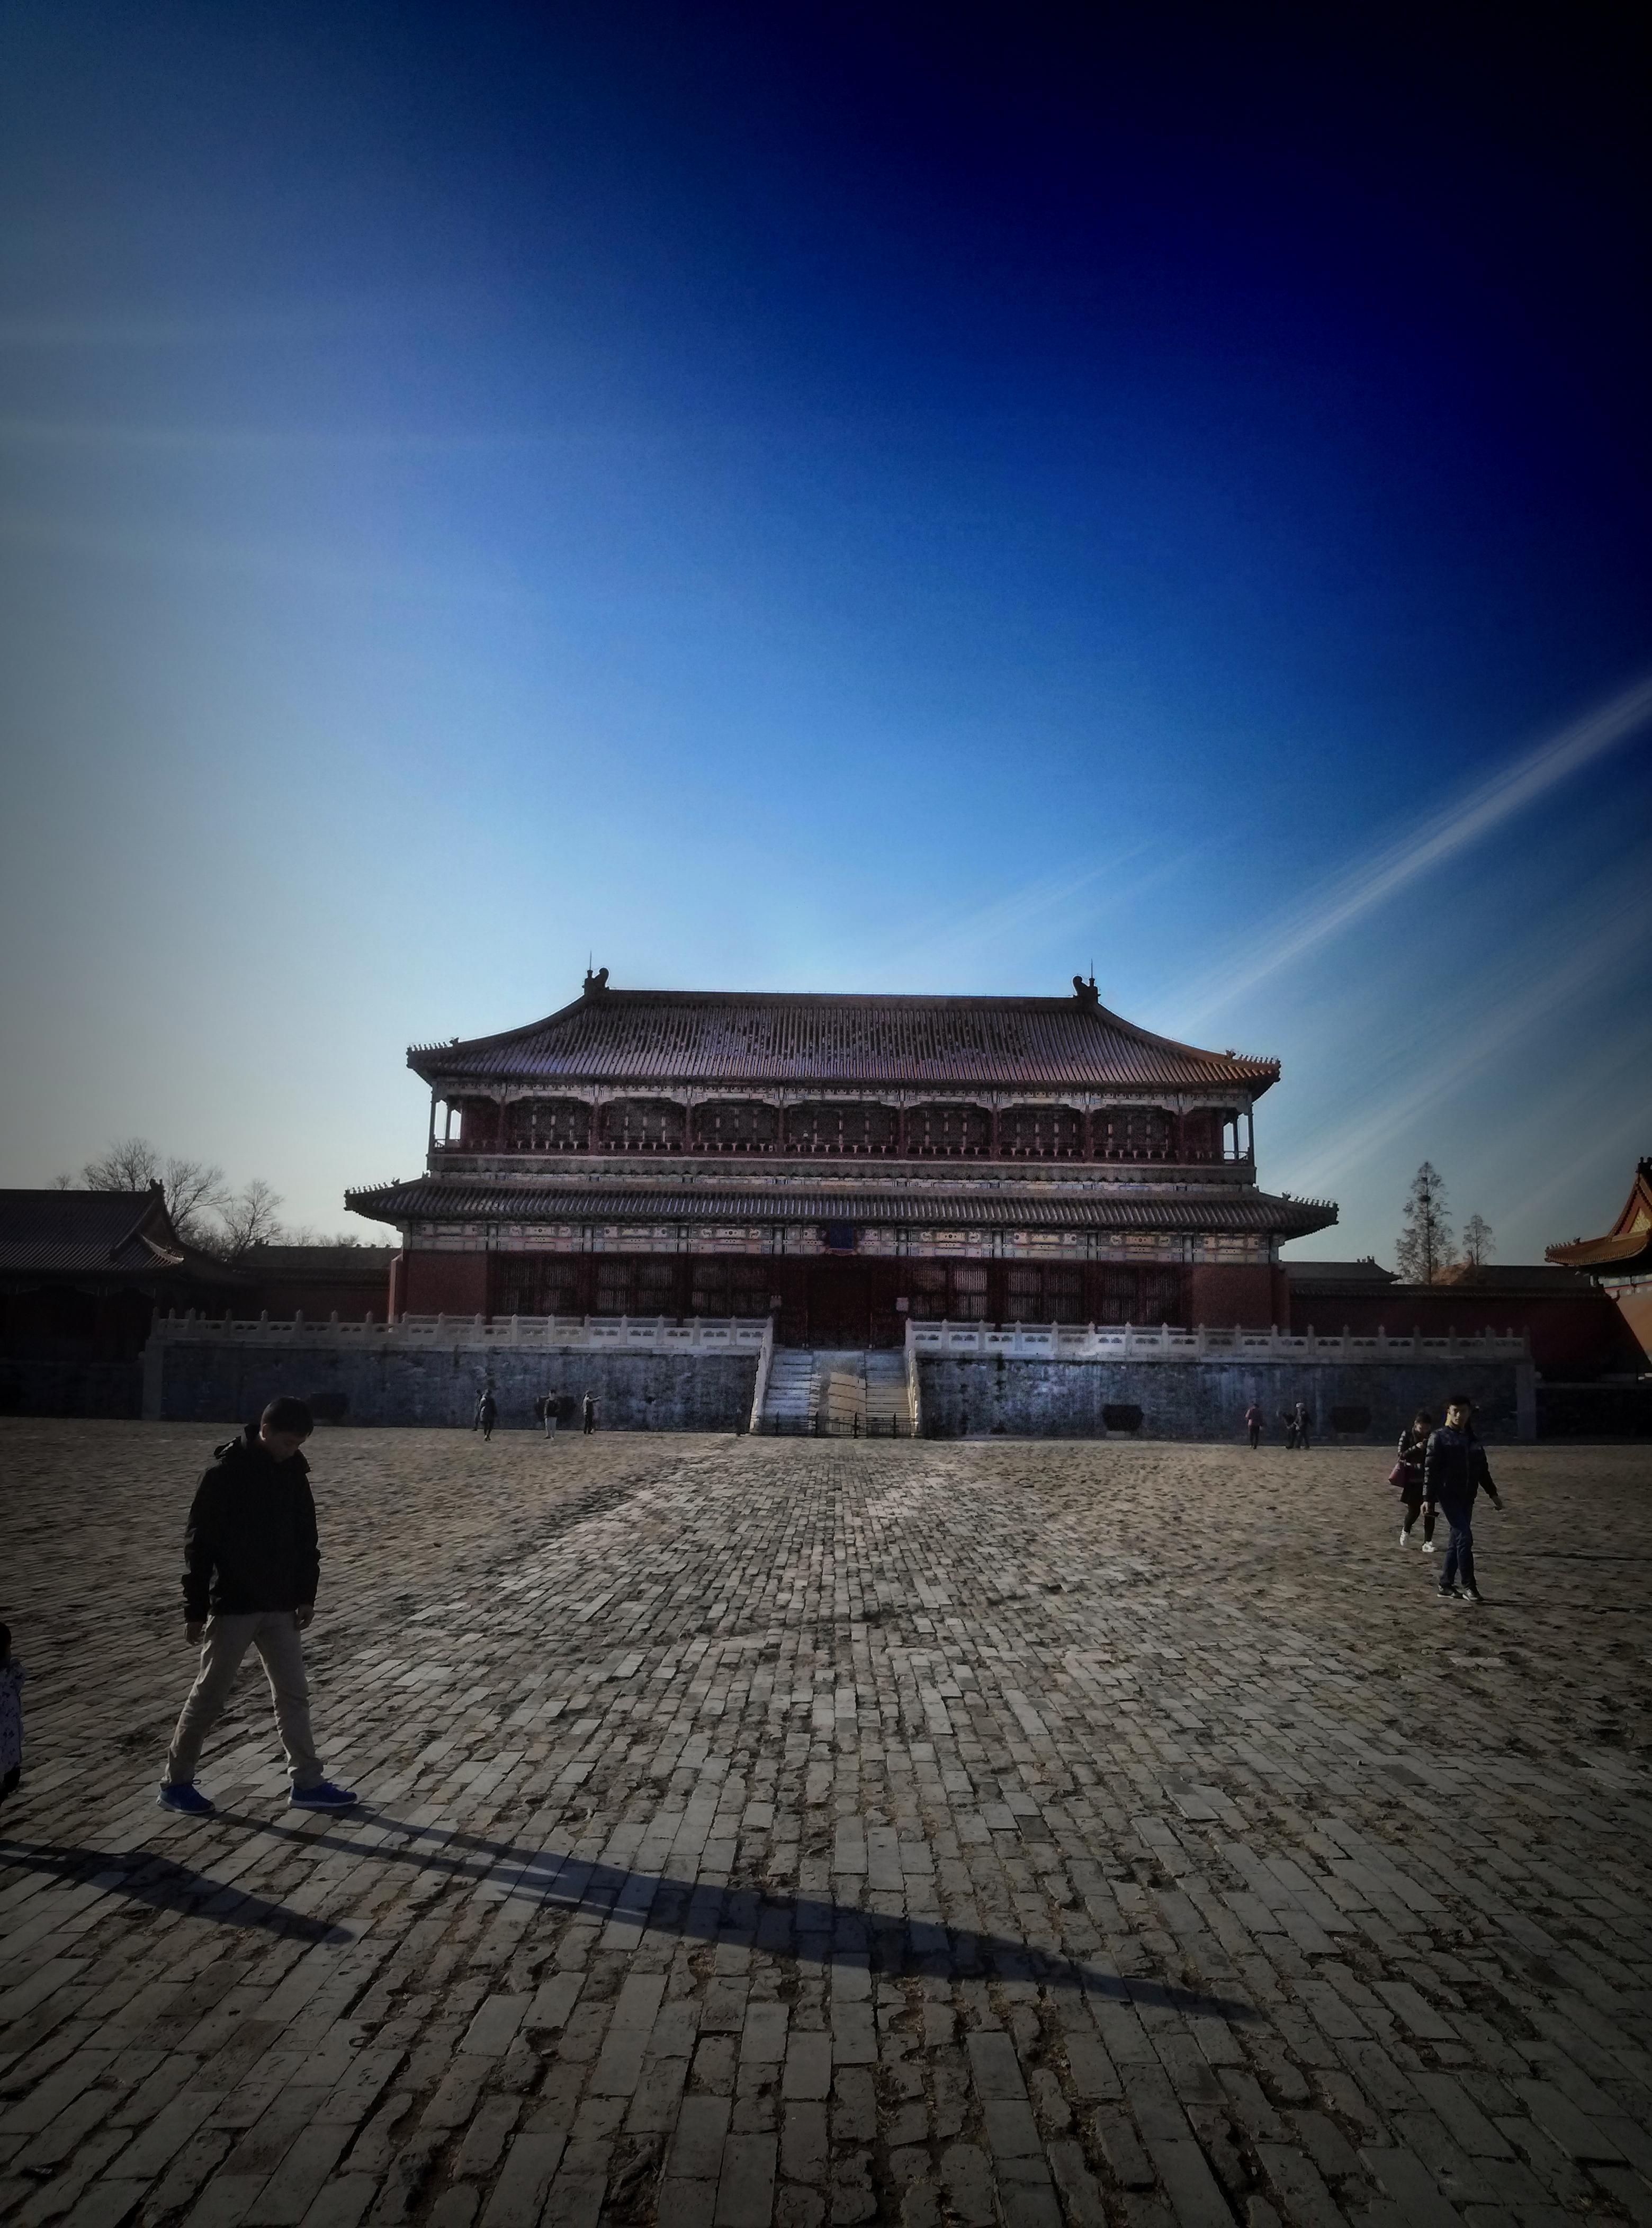 2015.12.05 x 京。Business Trip _LG GJ